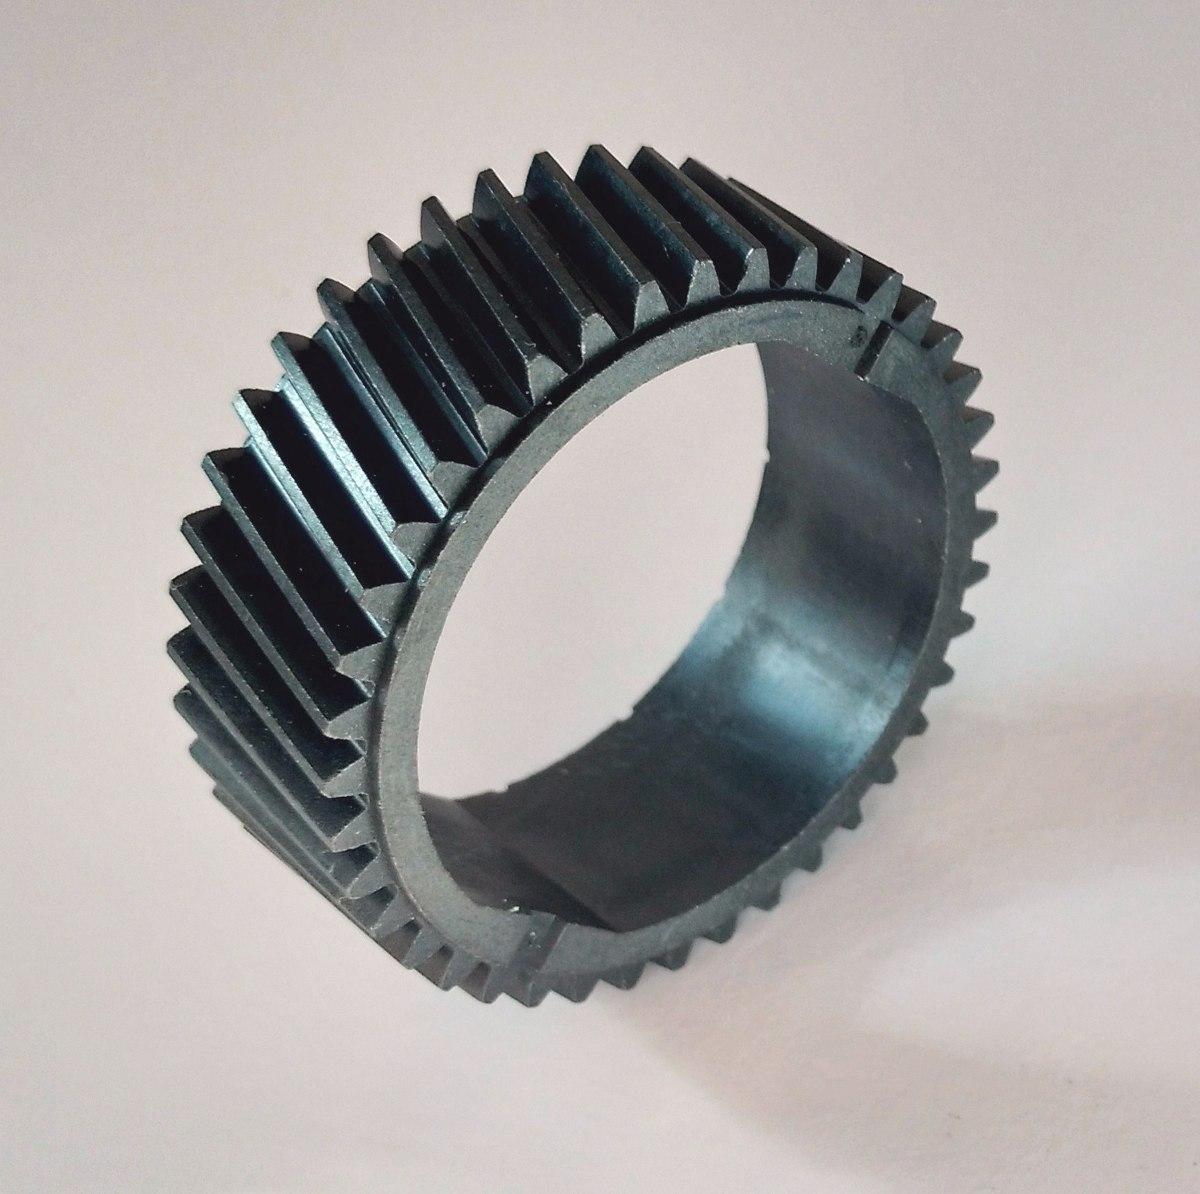 20 piezas AB01-2233 AB01-2062 40T fusor Superior de equipo para Ricoh 2051 de 2060 de 2075 MP5500 MP7000 MP7001 2051 de 2060 a 2075 MP55 de